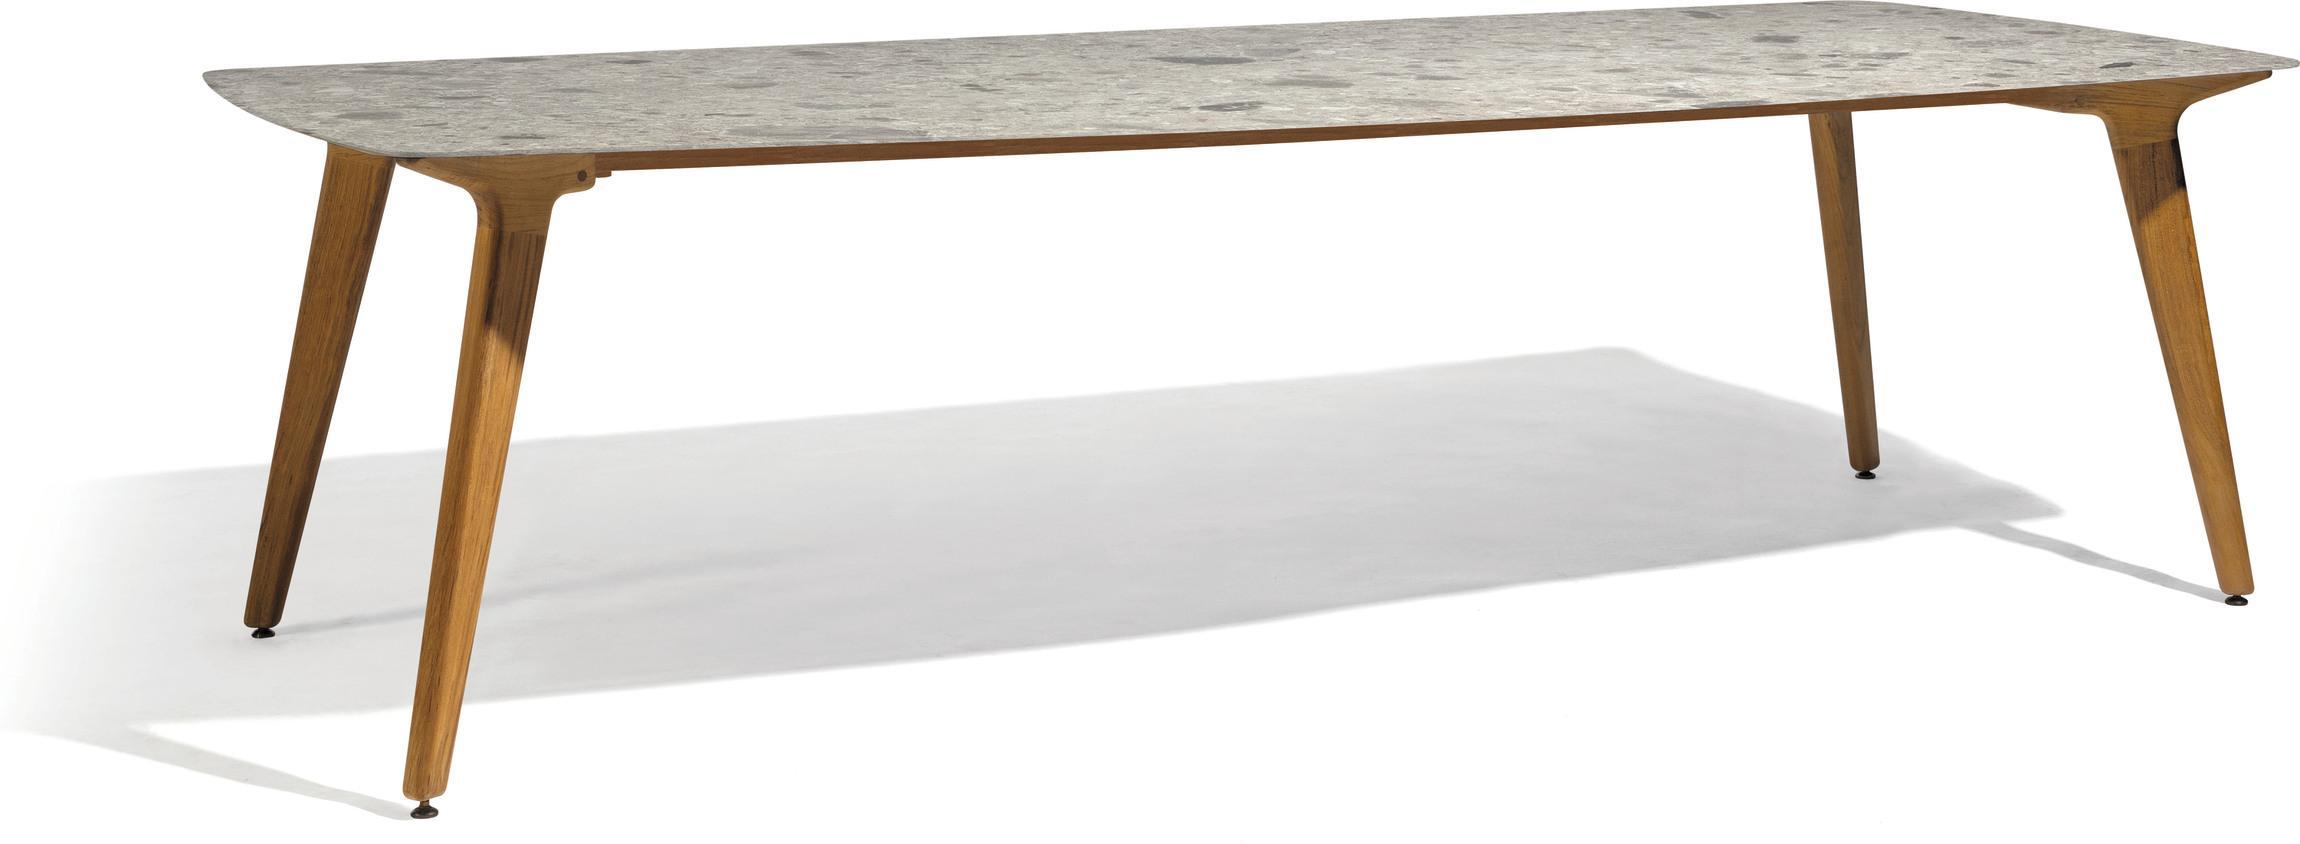 Table à manger Torsa - Teck - CF 264